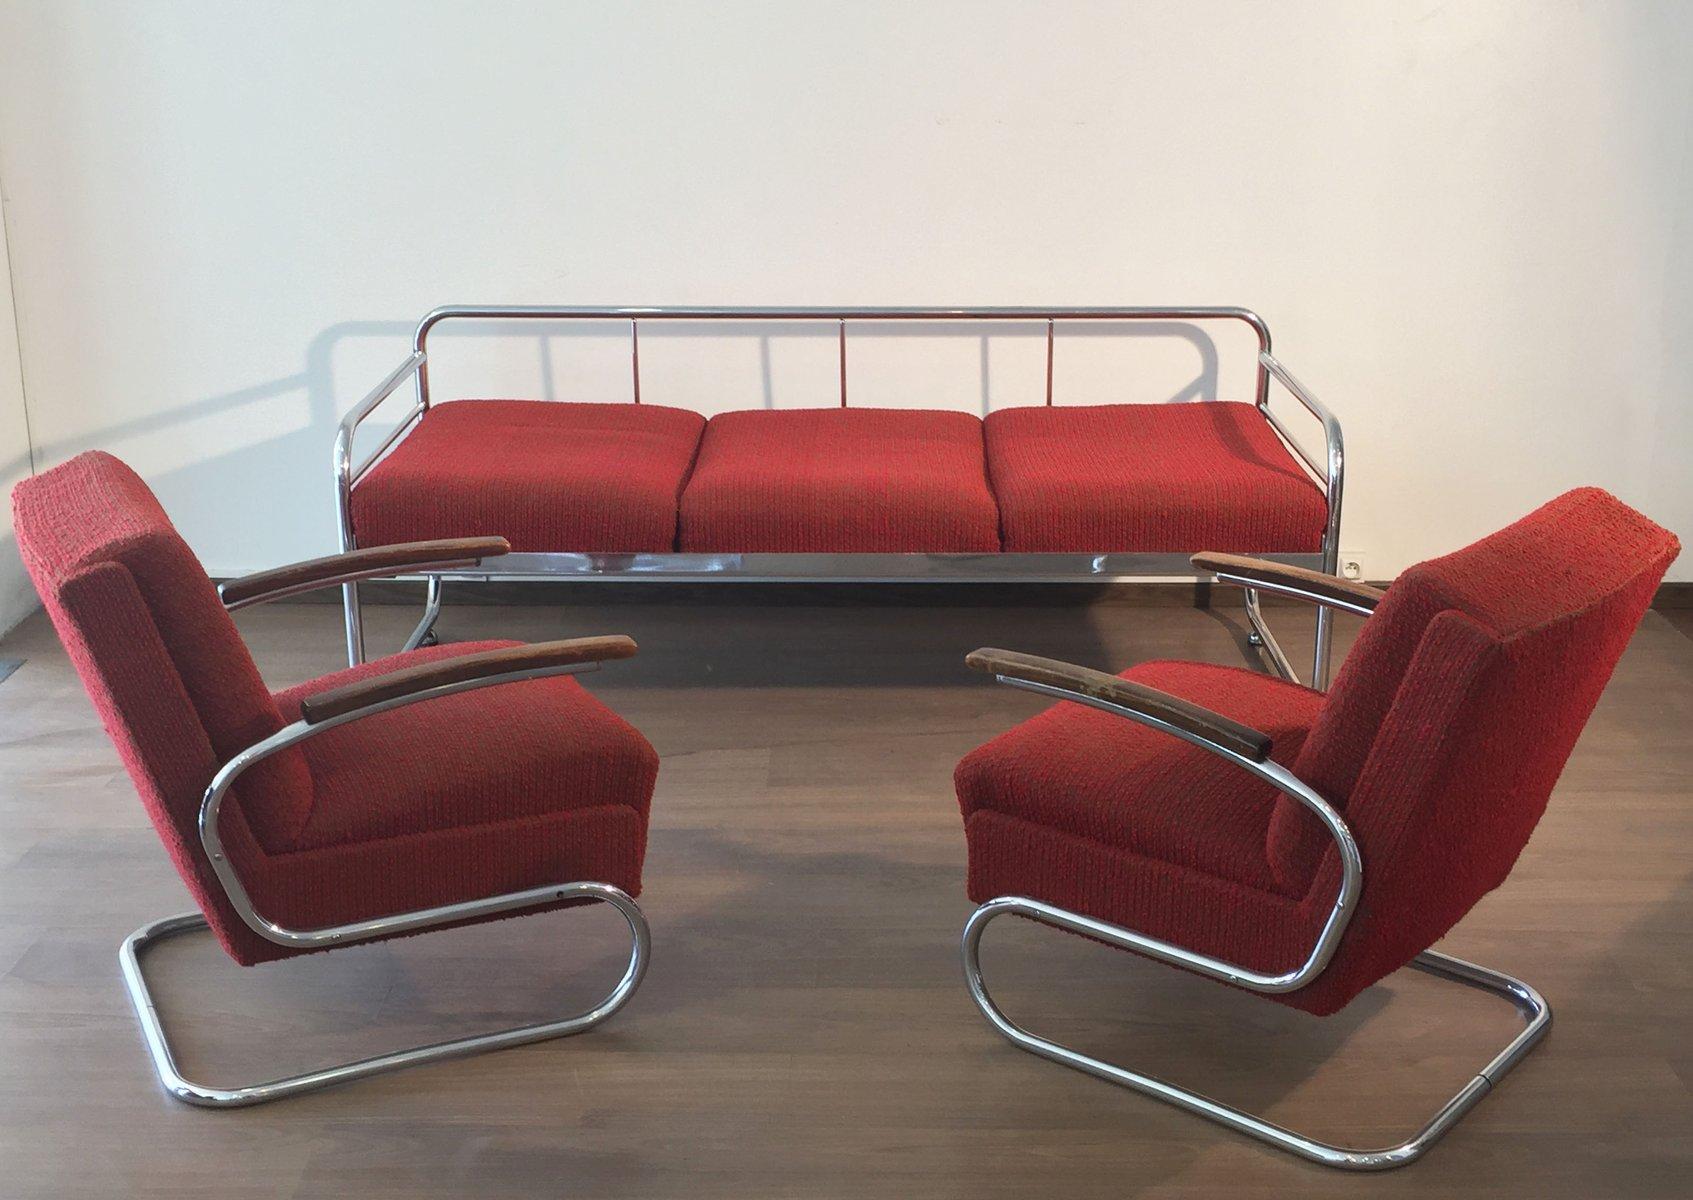 Czech Tubular Modernist Bauhaus Sofa From Slezak Zavody 1930s For